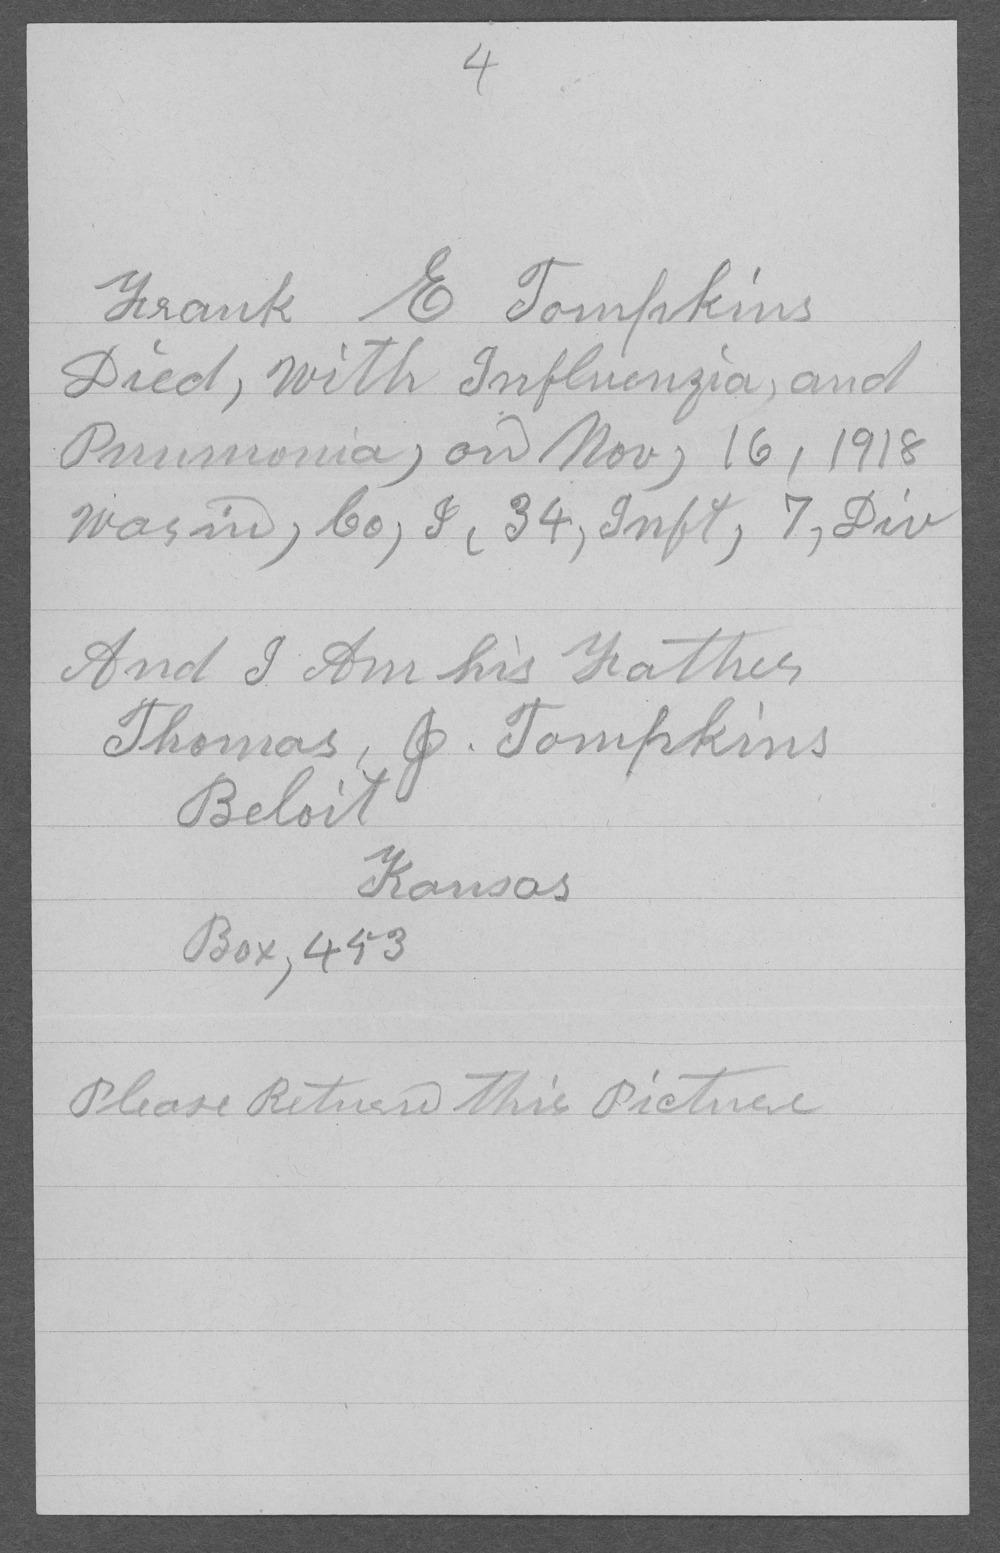 Frank E. Tompkins, World War I soldier - 6